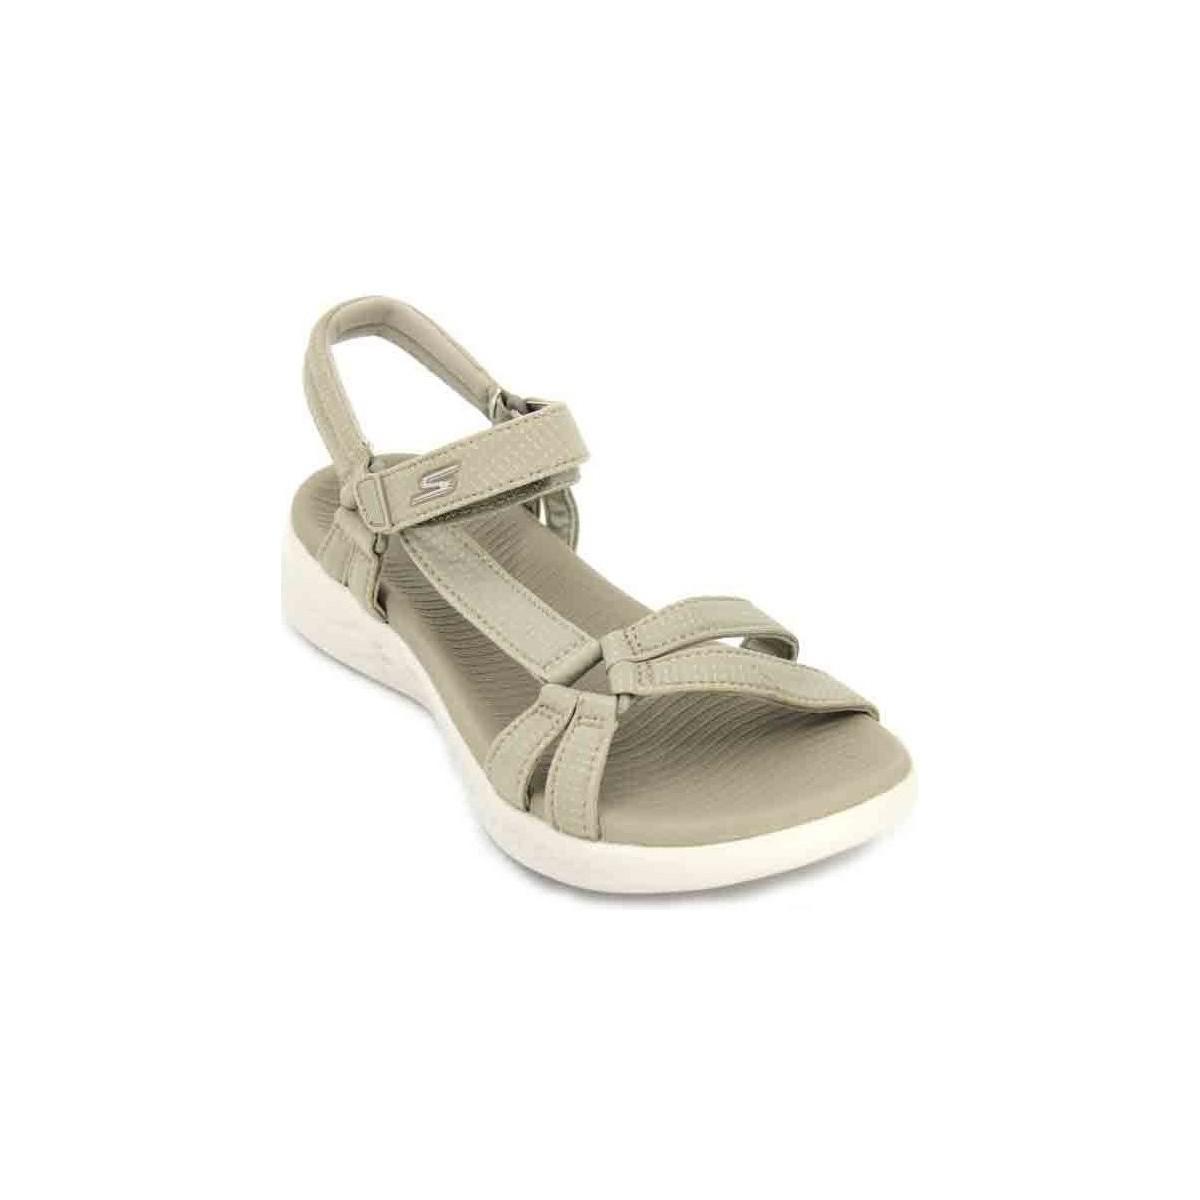 c2bd0b6a44b8 Skechers On The Go 600 Brilliancy 15316 Women s Sandals Women s ...